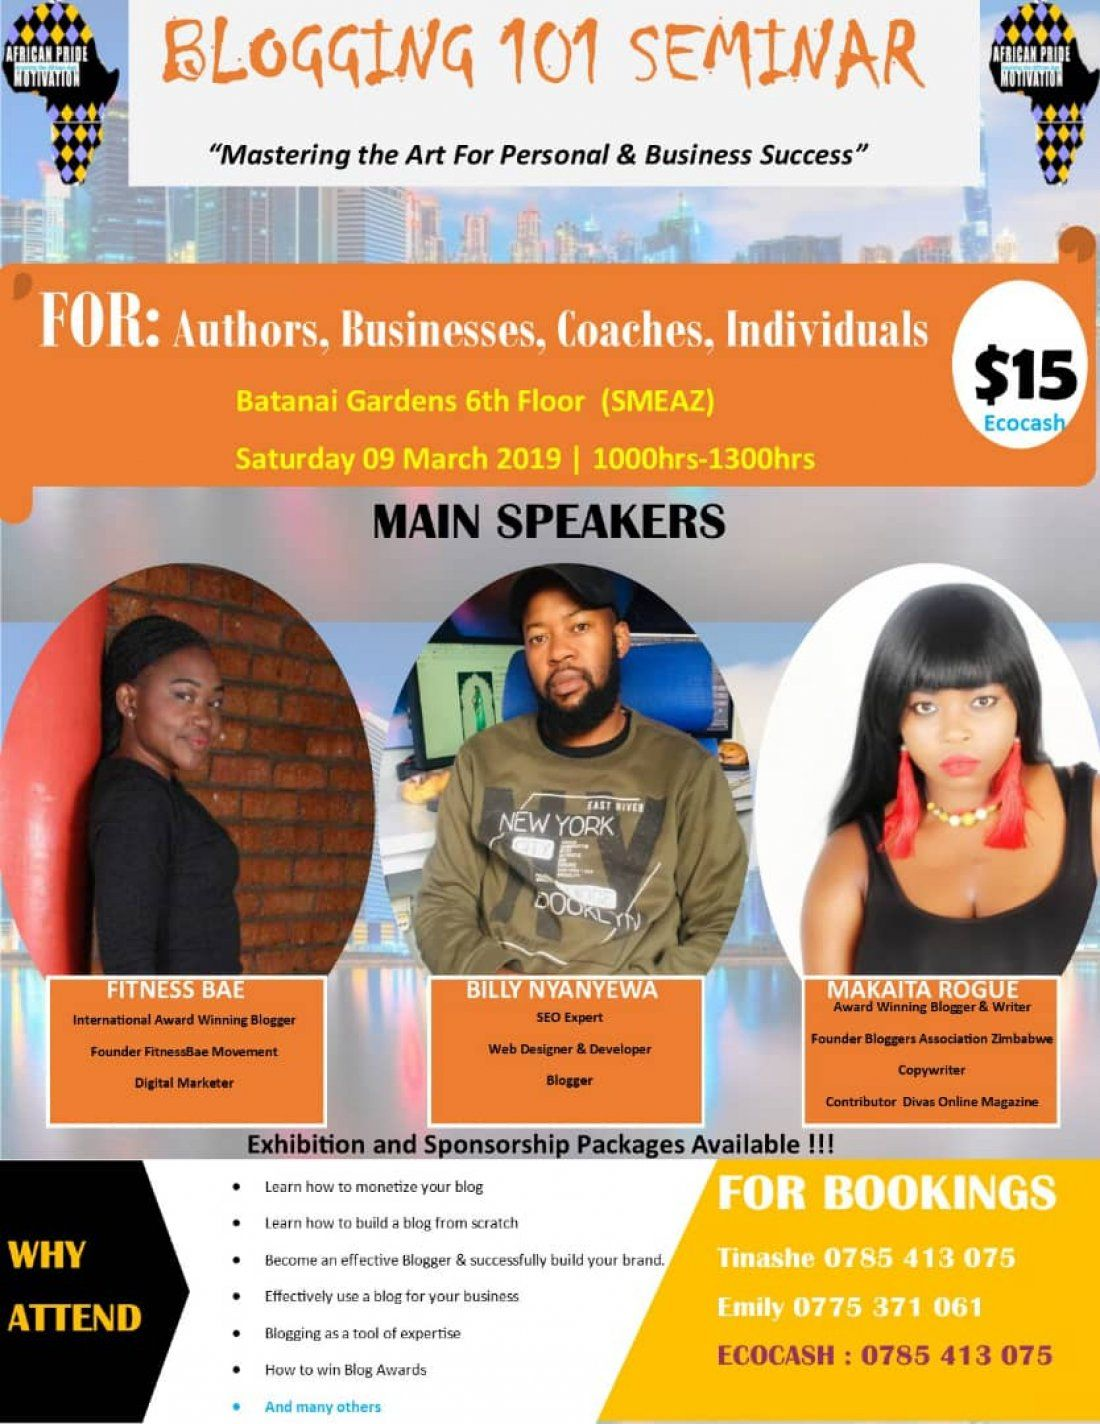 Blogging 101 Seminar